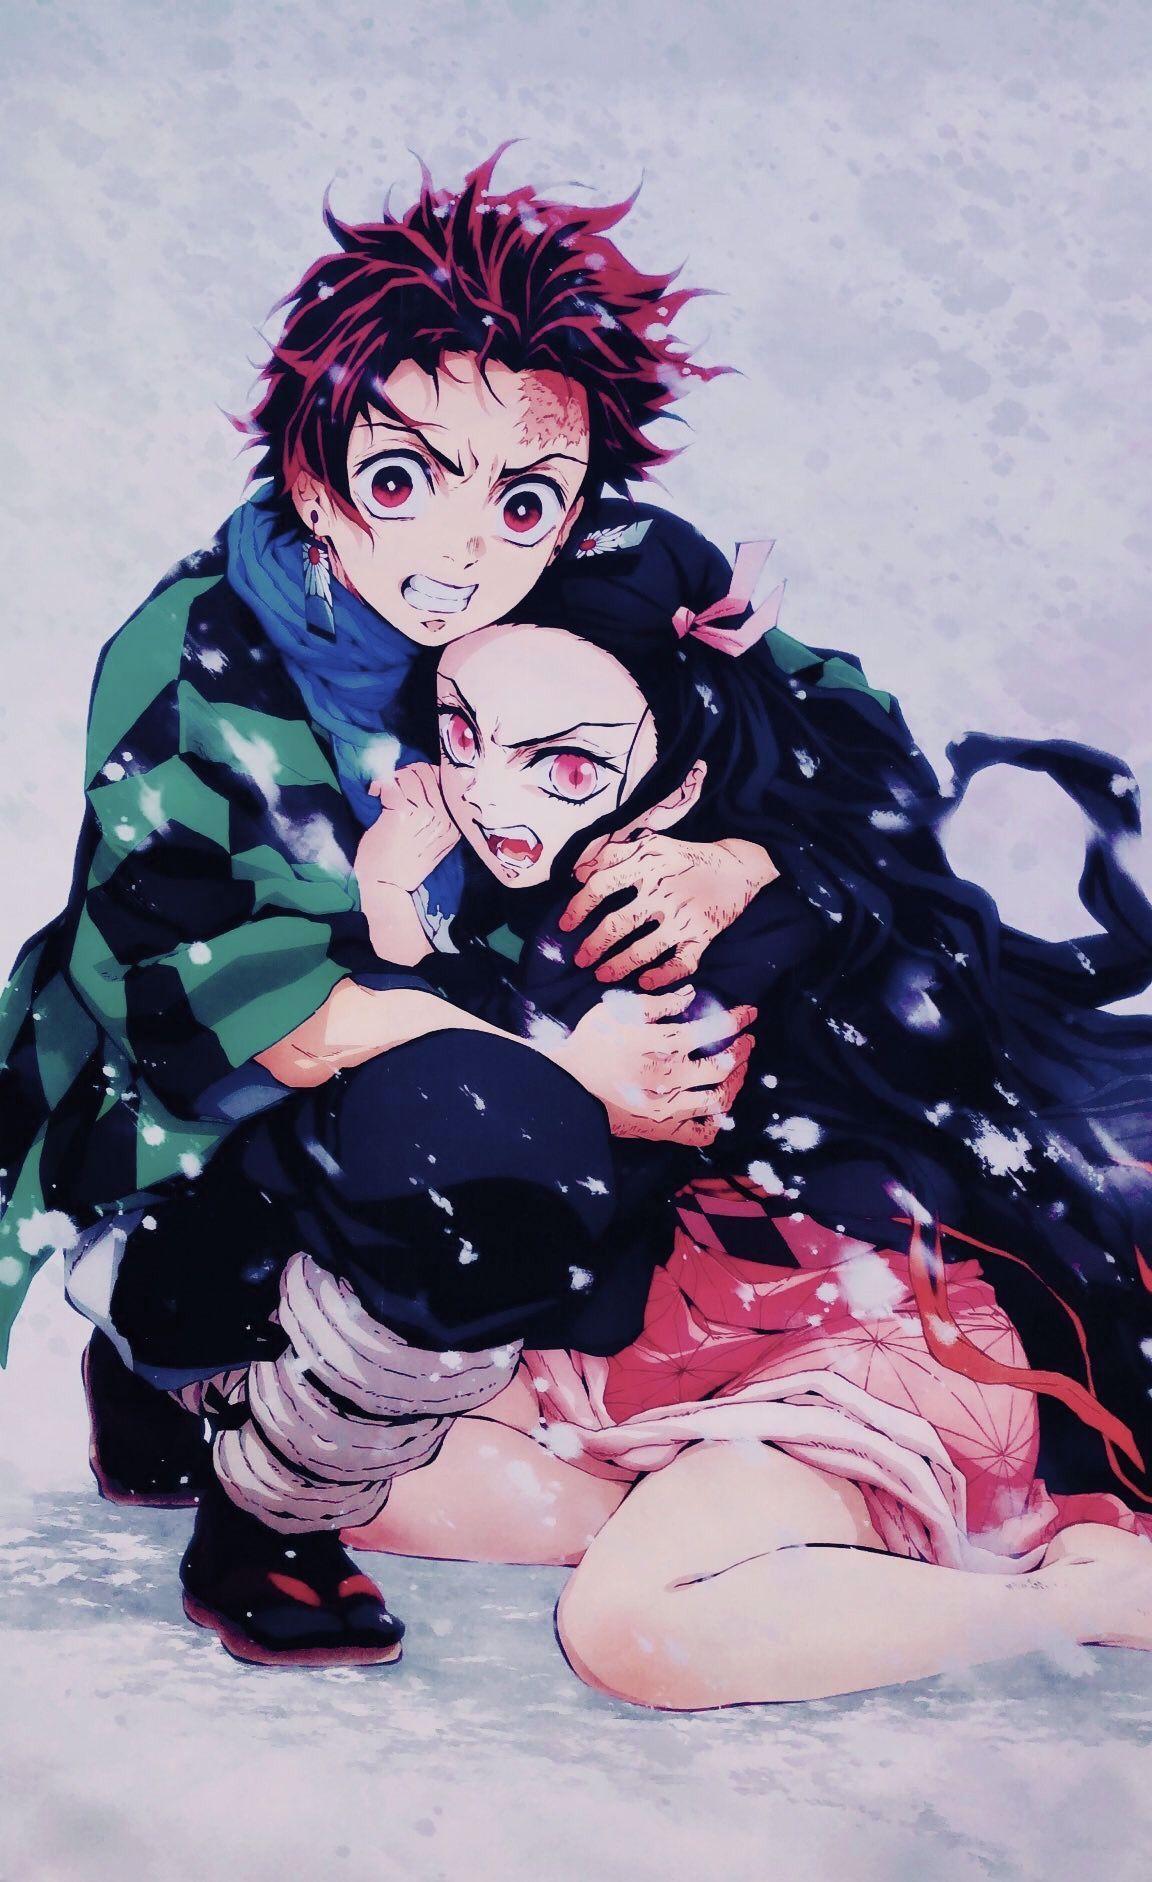 Nezuko Tanjiro Hai Anh Em In 2020 Aesthetic Anime Anime Slayer Anime